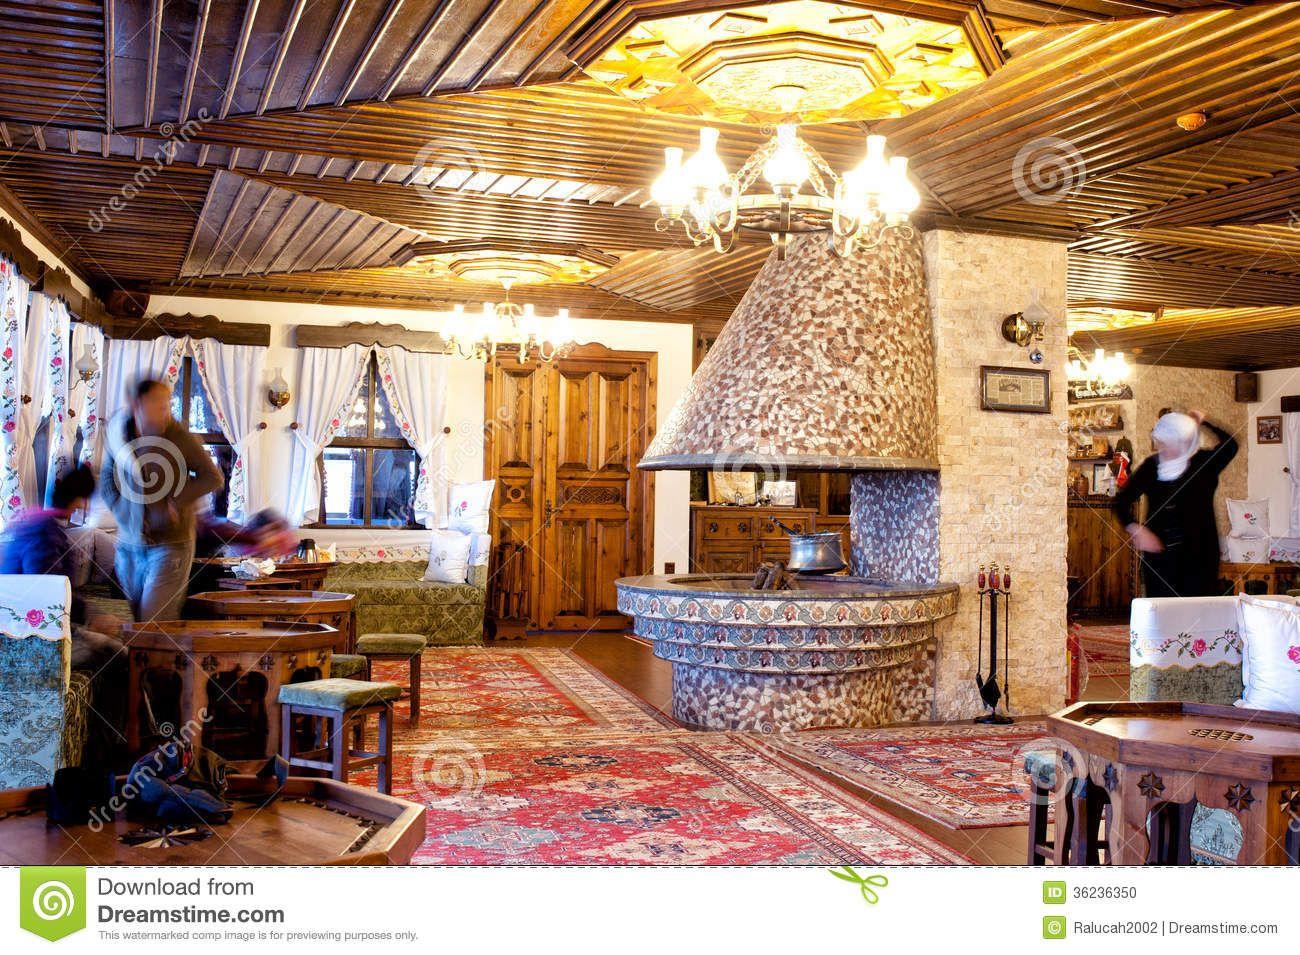 turkish hotel interior google traditional interiorhotel interiors - Traditional Hotel Interior